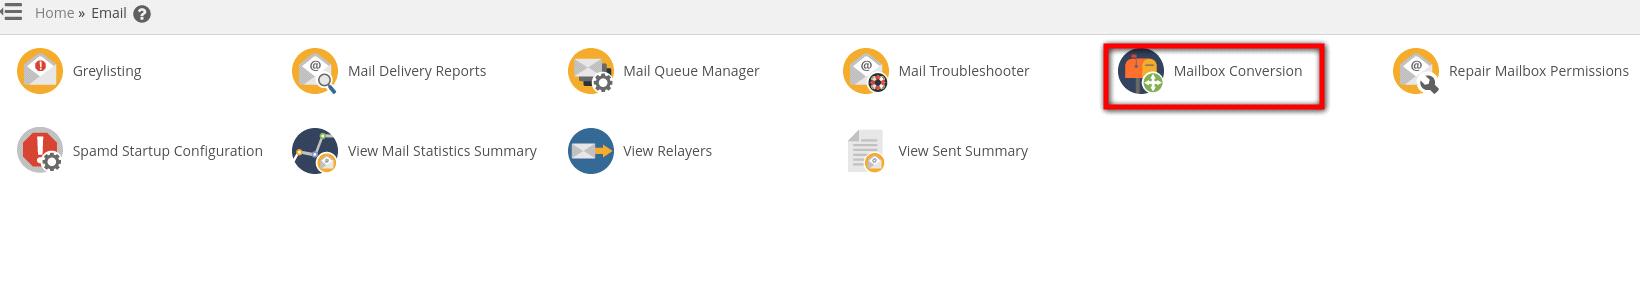 Mailbox Conversion